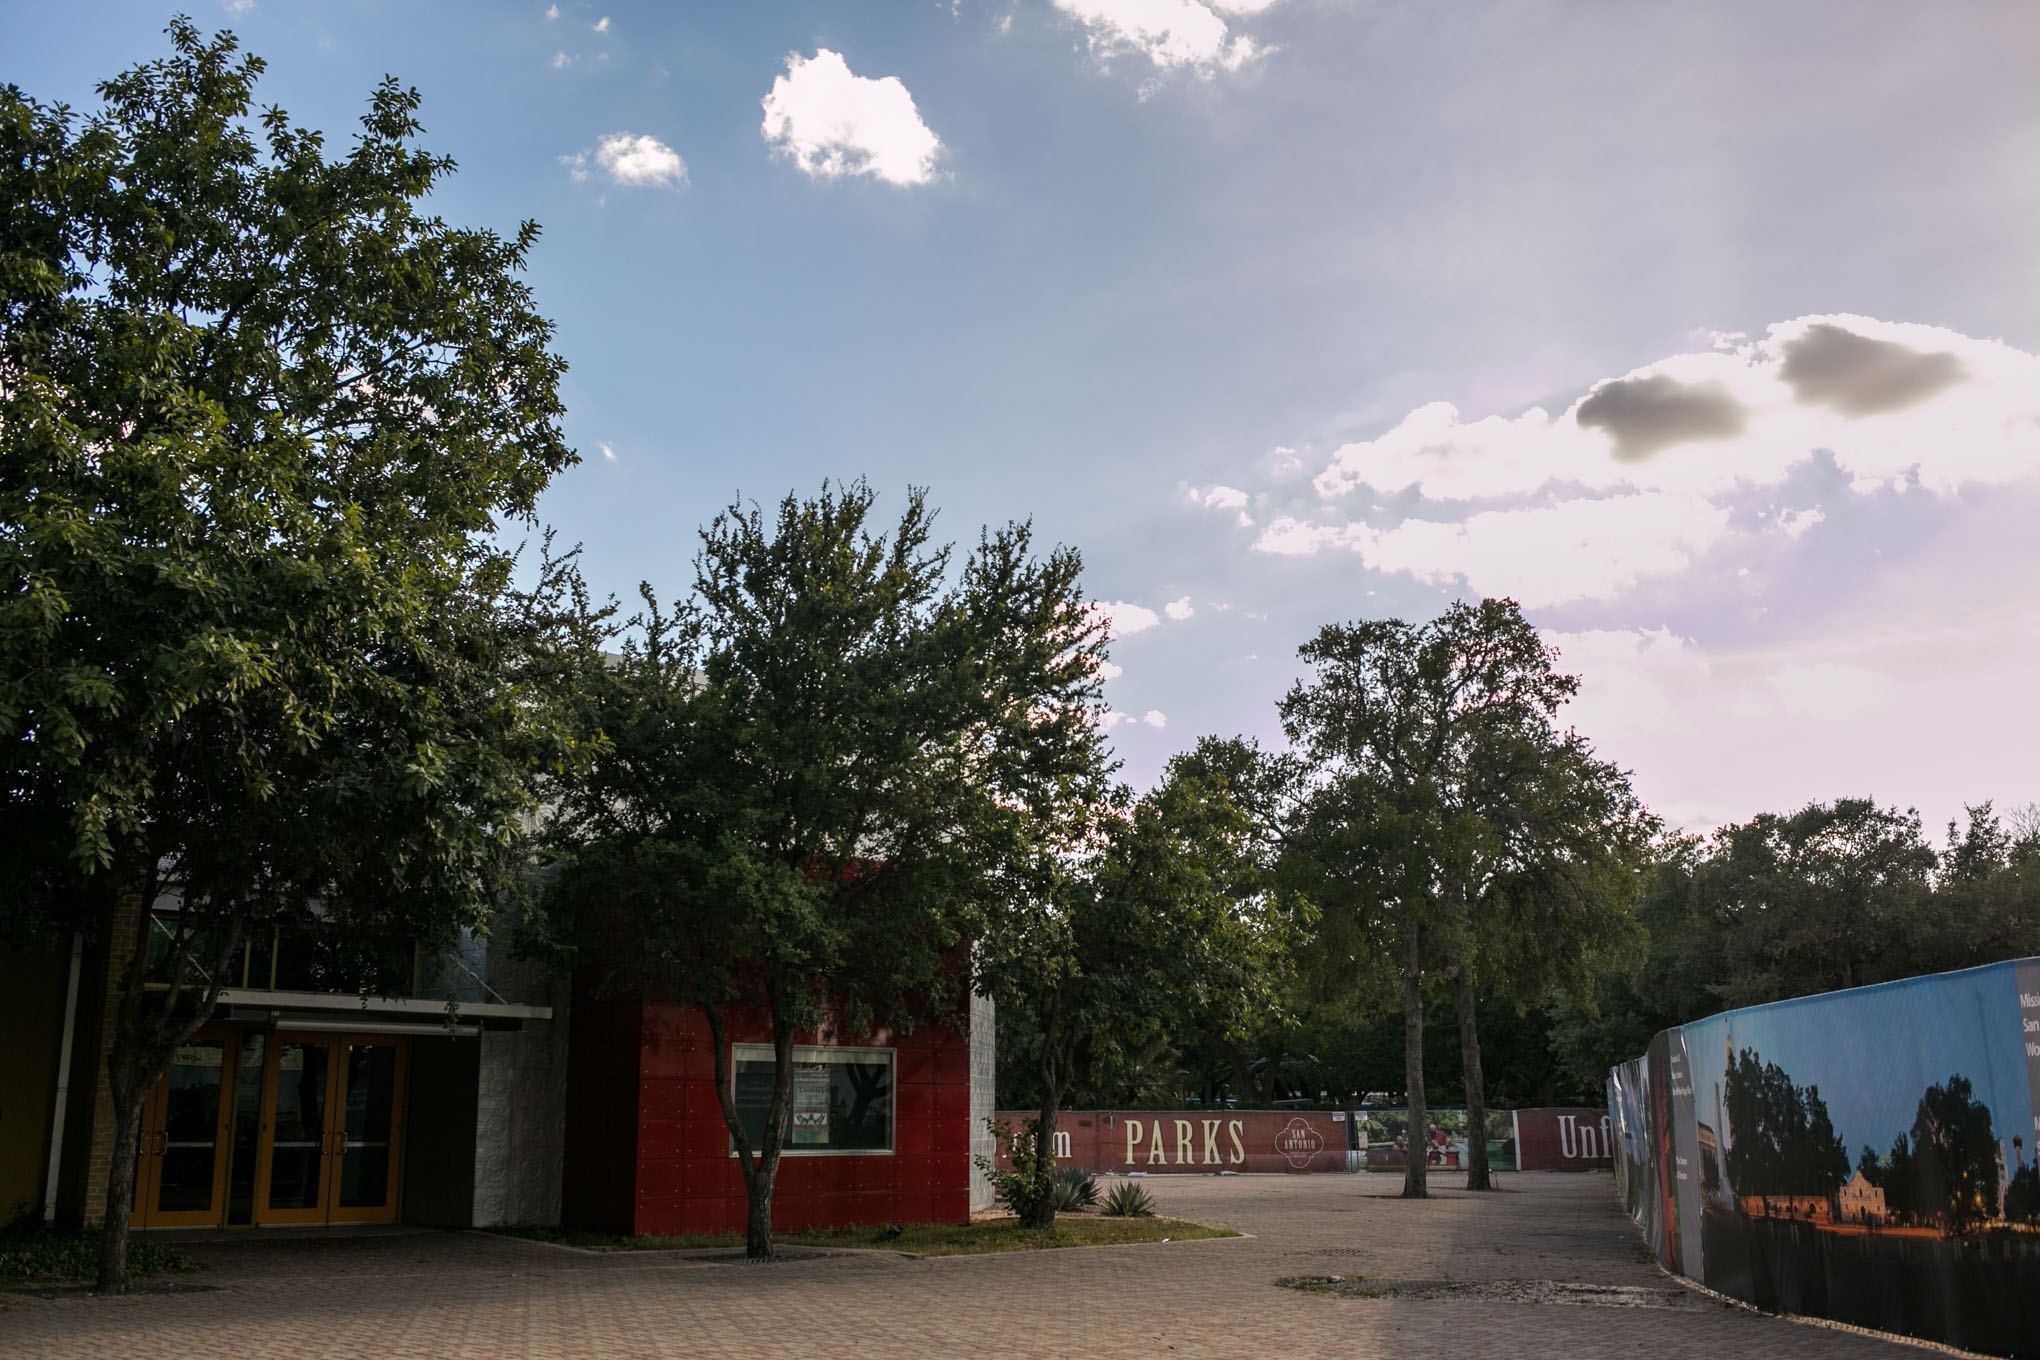 Construction alongside Instituto Cultural de México. Photo by Kathryn Boyd-Batstone.